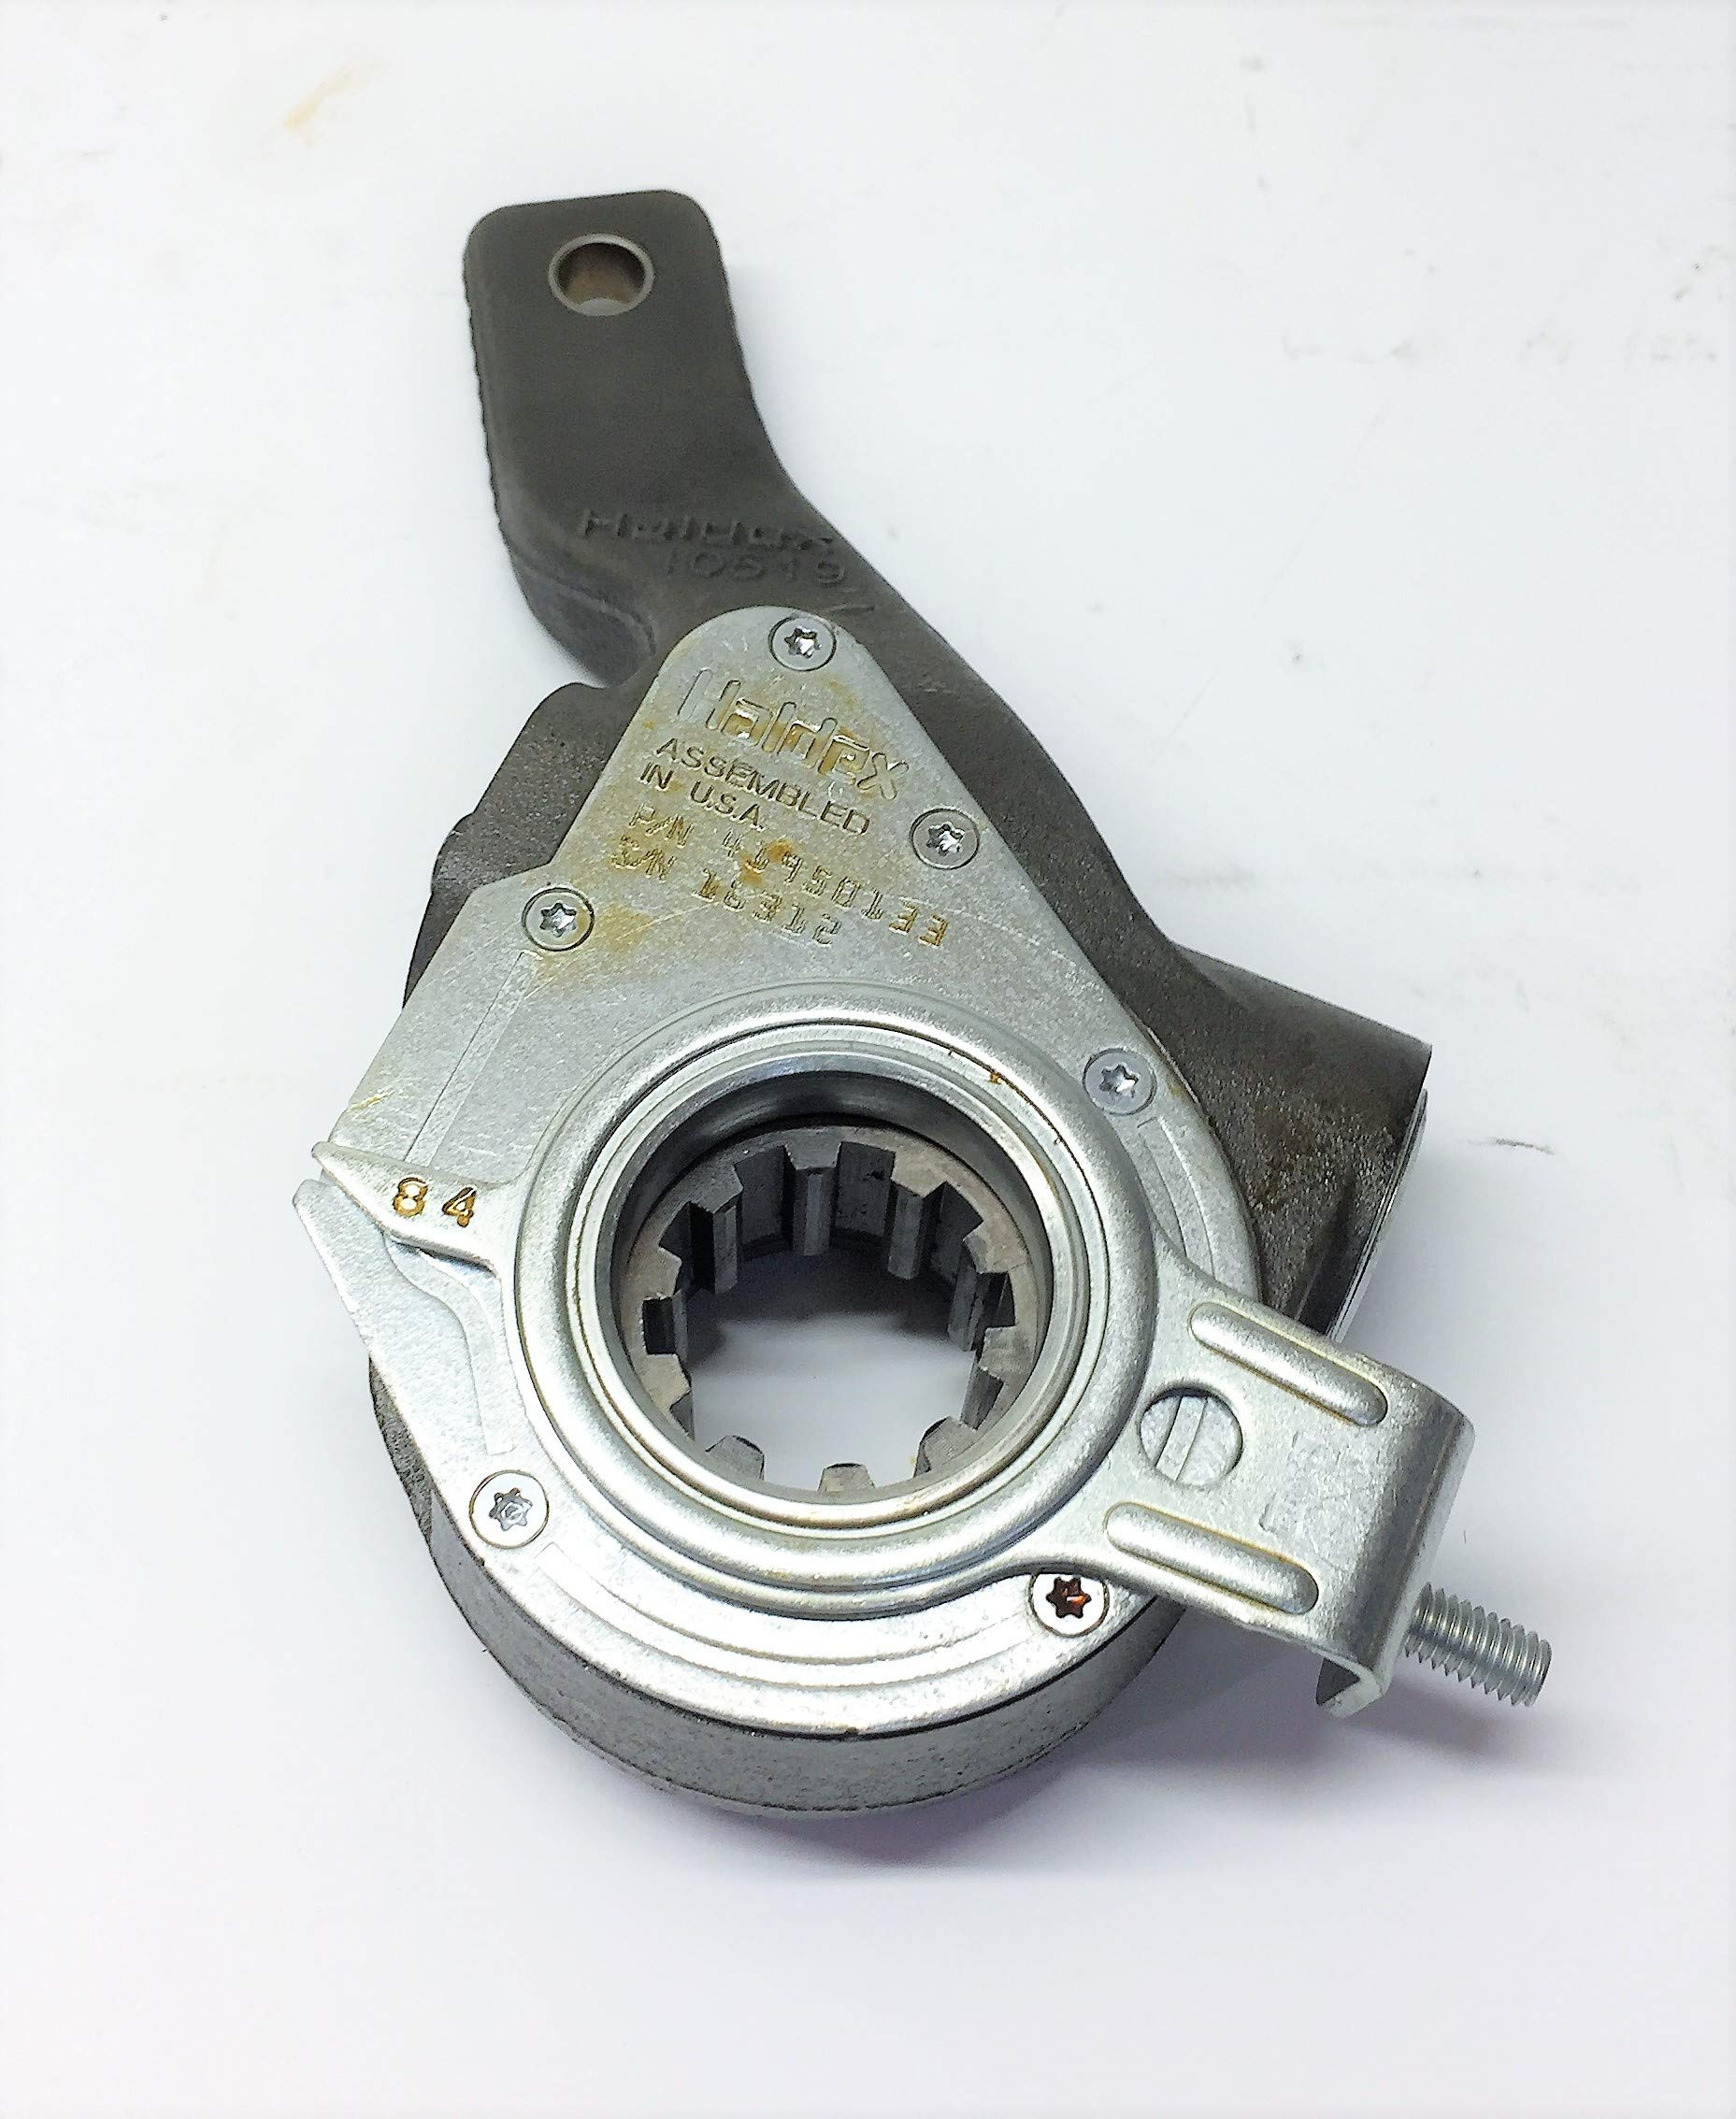 Haldex Automatic Brake Adjuster 300-10001 by Haldex (Image #1)